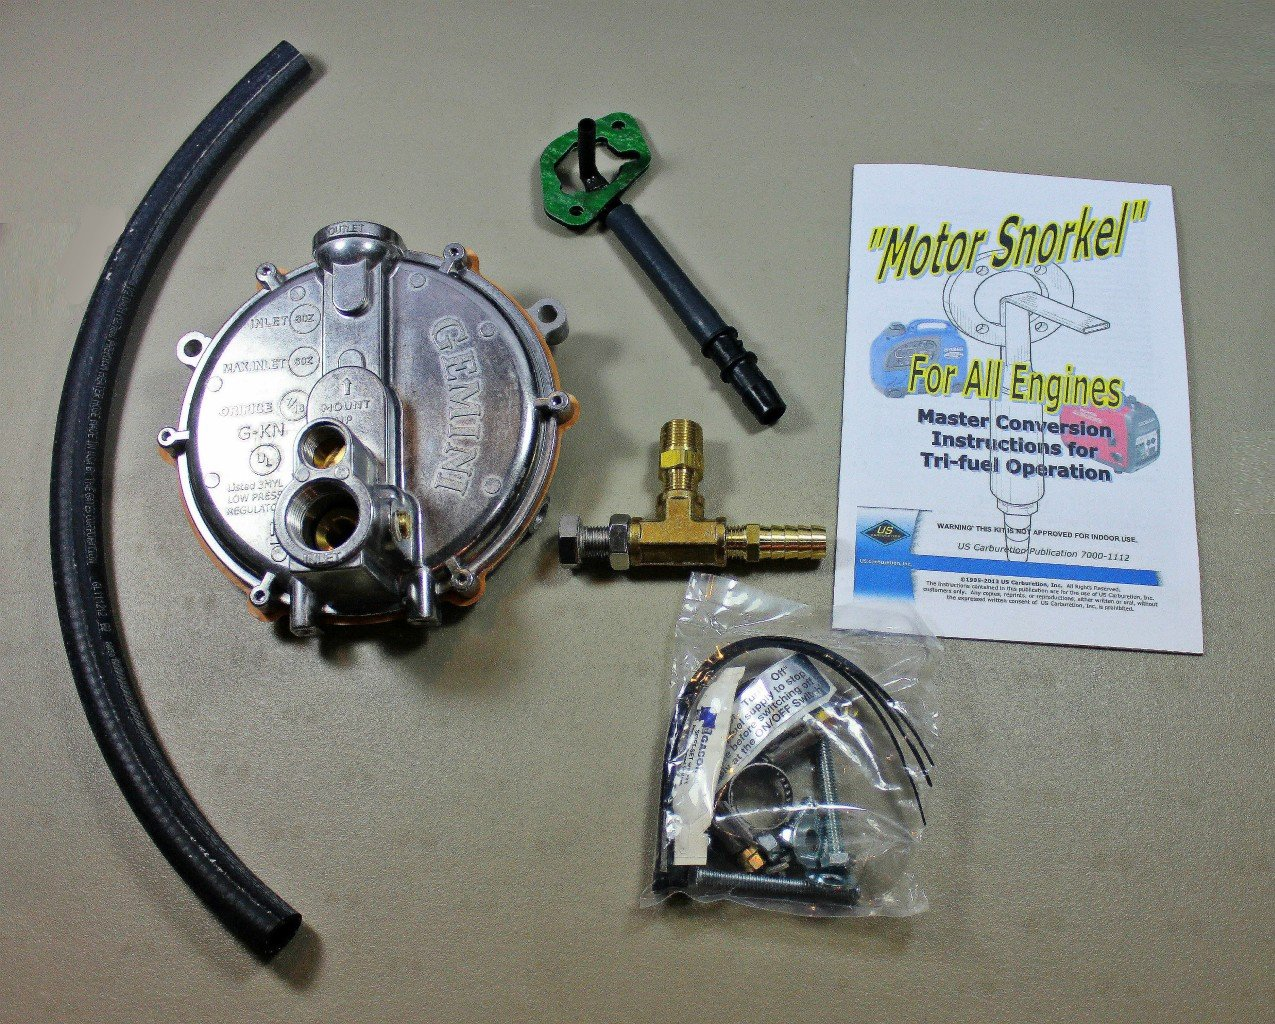 Yamaha EF2200i  Snorkel Propane Natural Gas Generators Triple Fuel